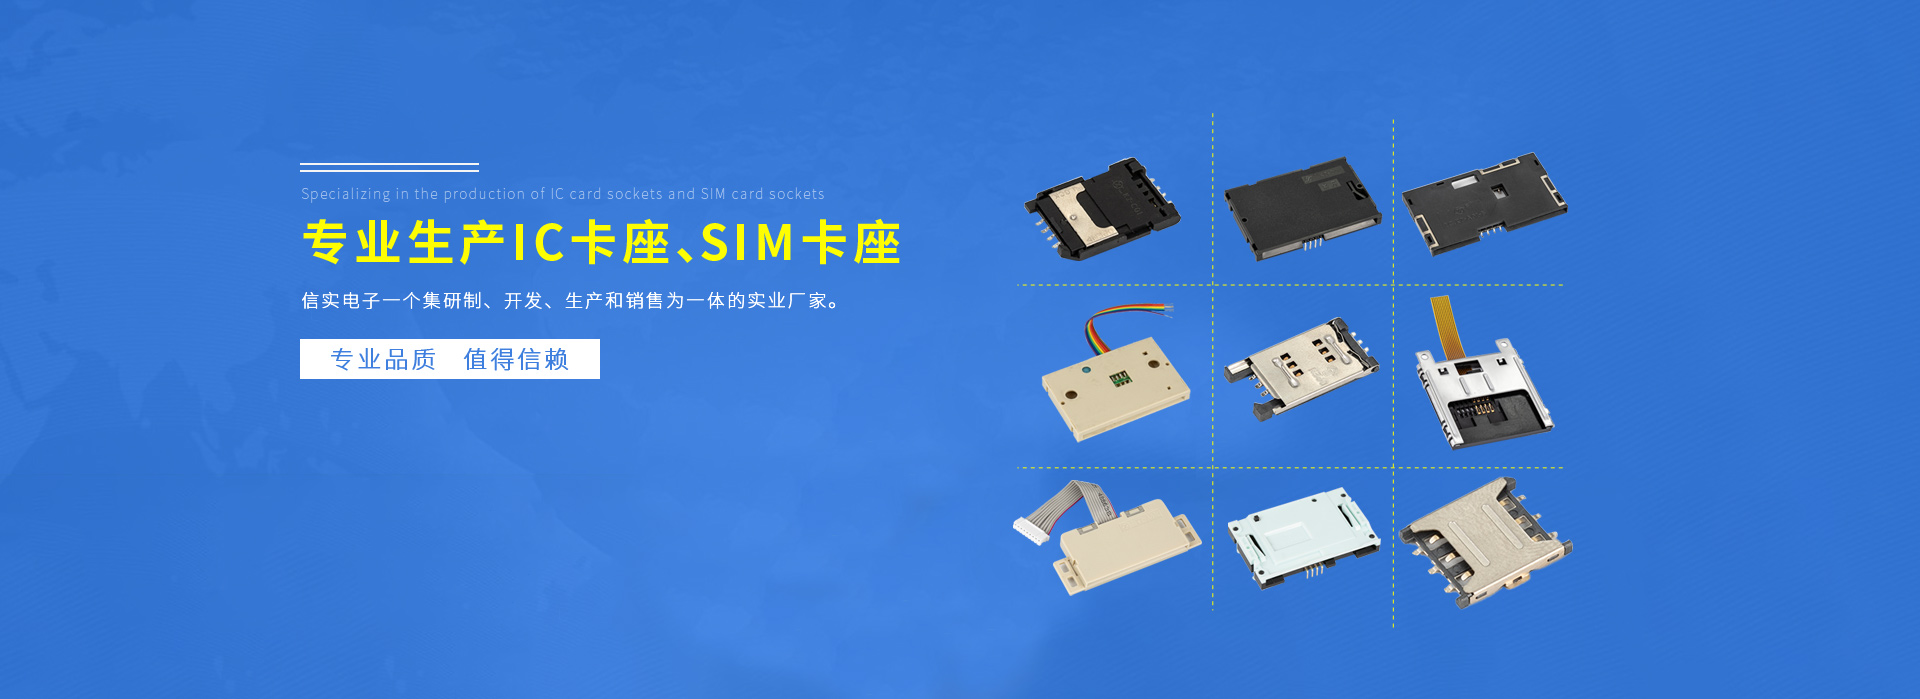 http://www.ic-card.cn/data/upload/202011/20201126094219_148.jpg